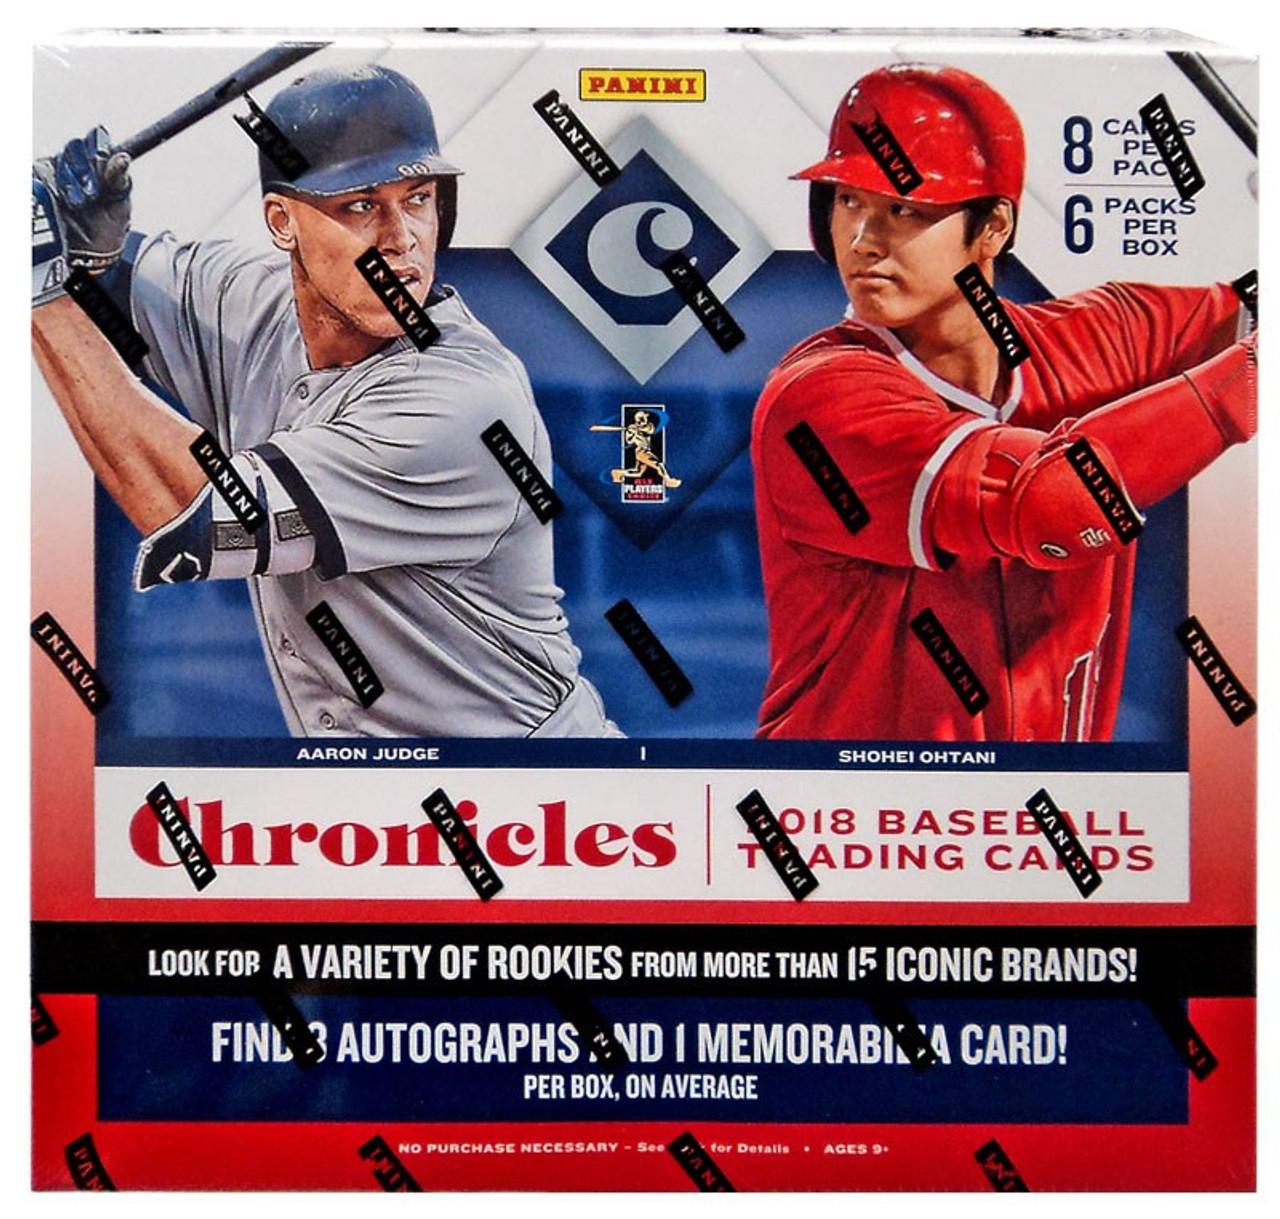 Mlb Chronicles 2018 Baseball Trading Card Hobby Box 6 Packs Panini